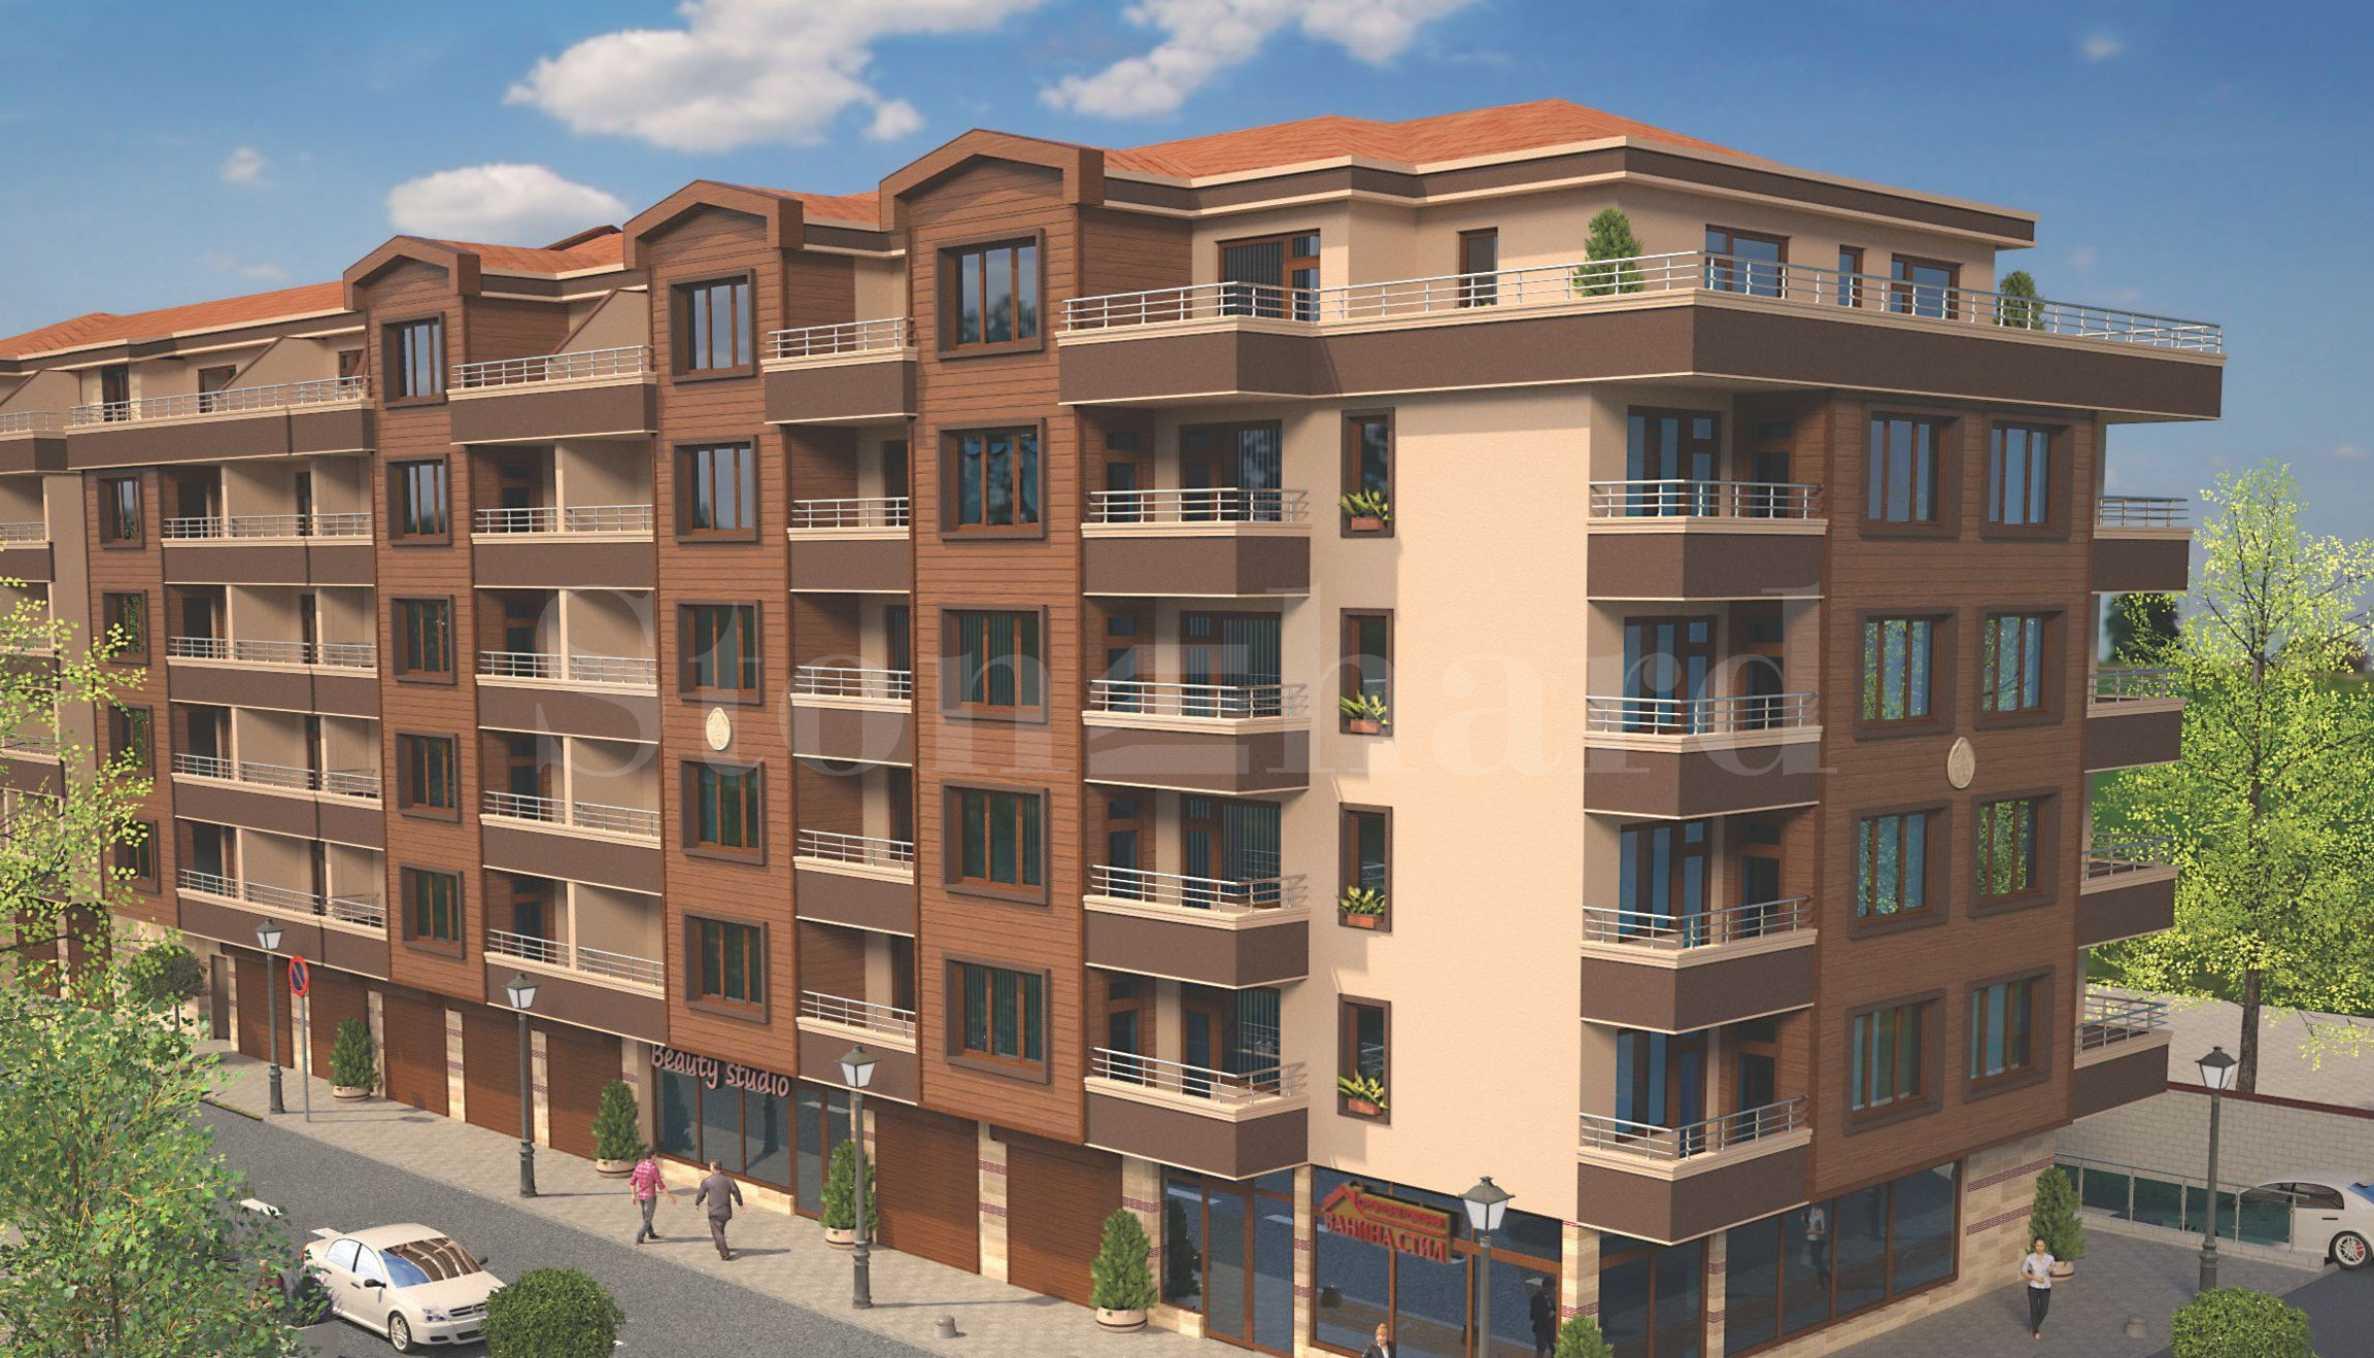 New mixed-use building near Burgas Free University 1 - Stonehard